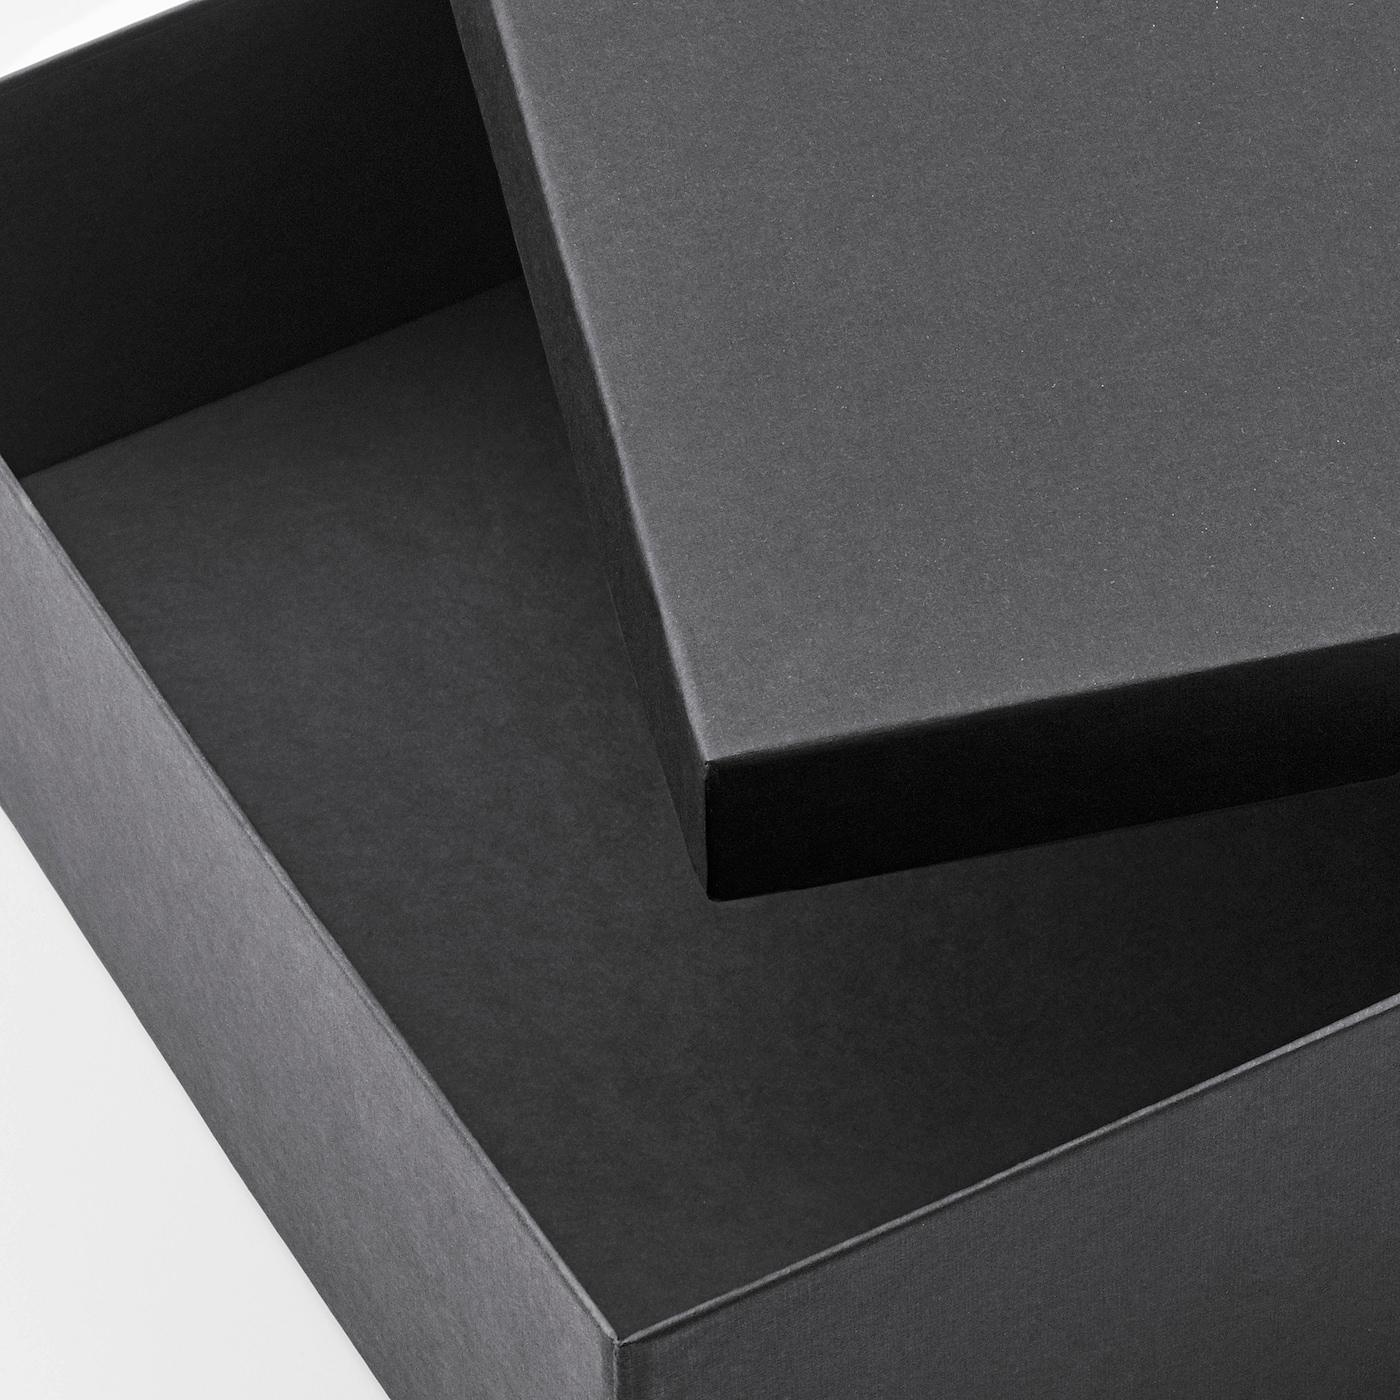 TJENA Storage box with lid, black, 25x35x10 cm